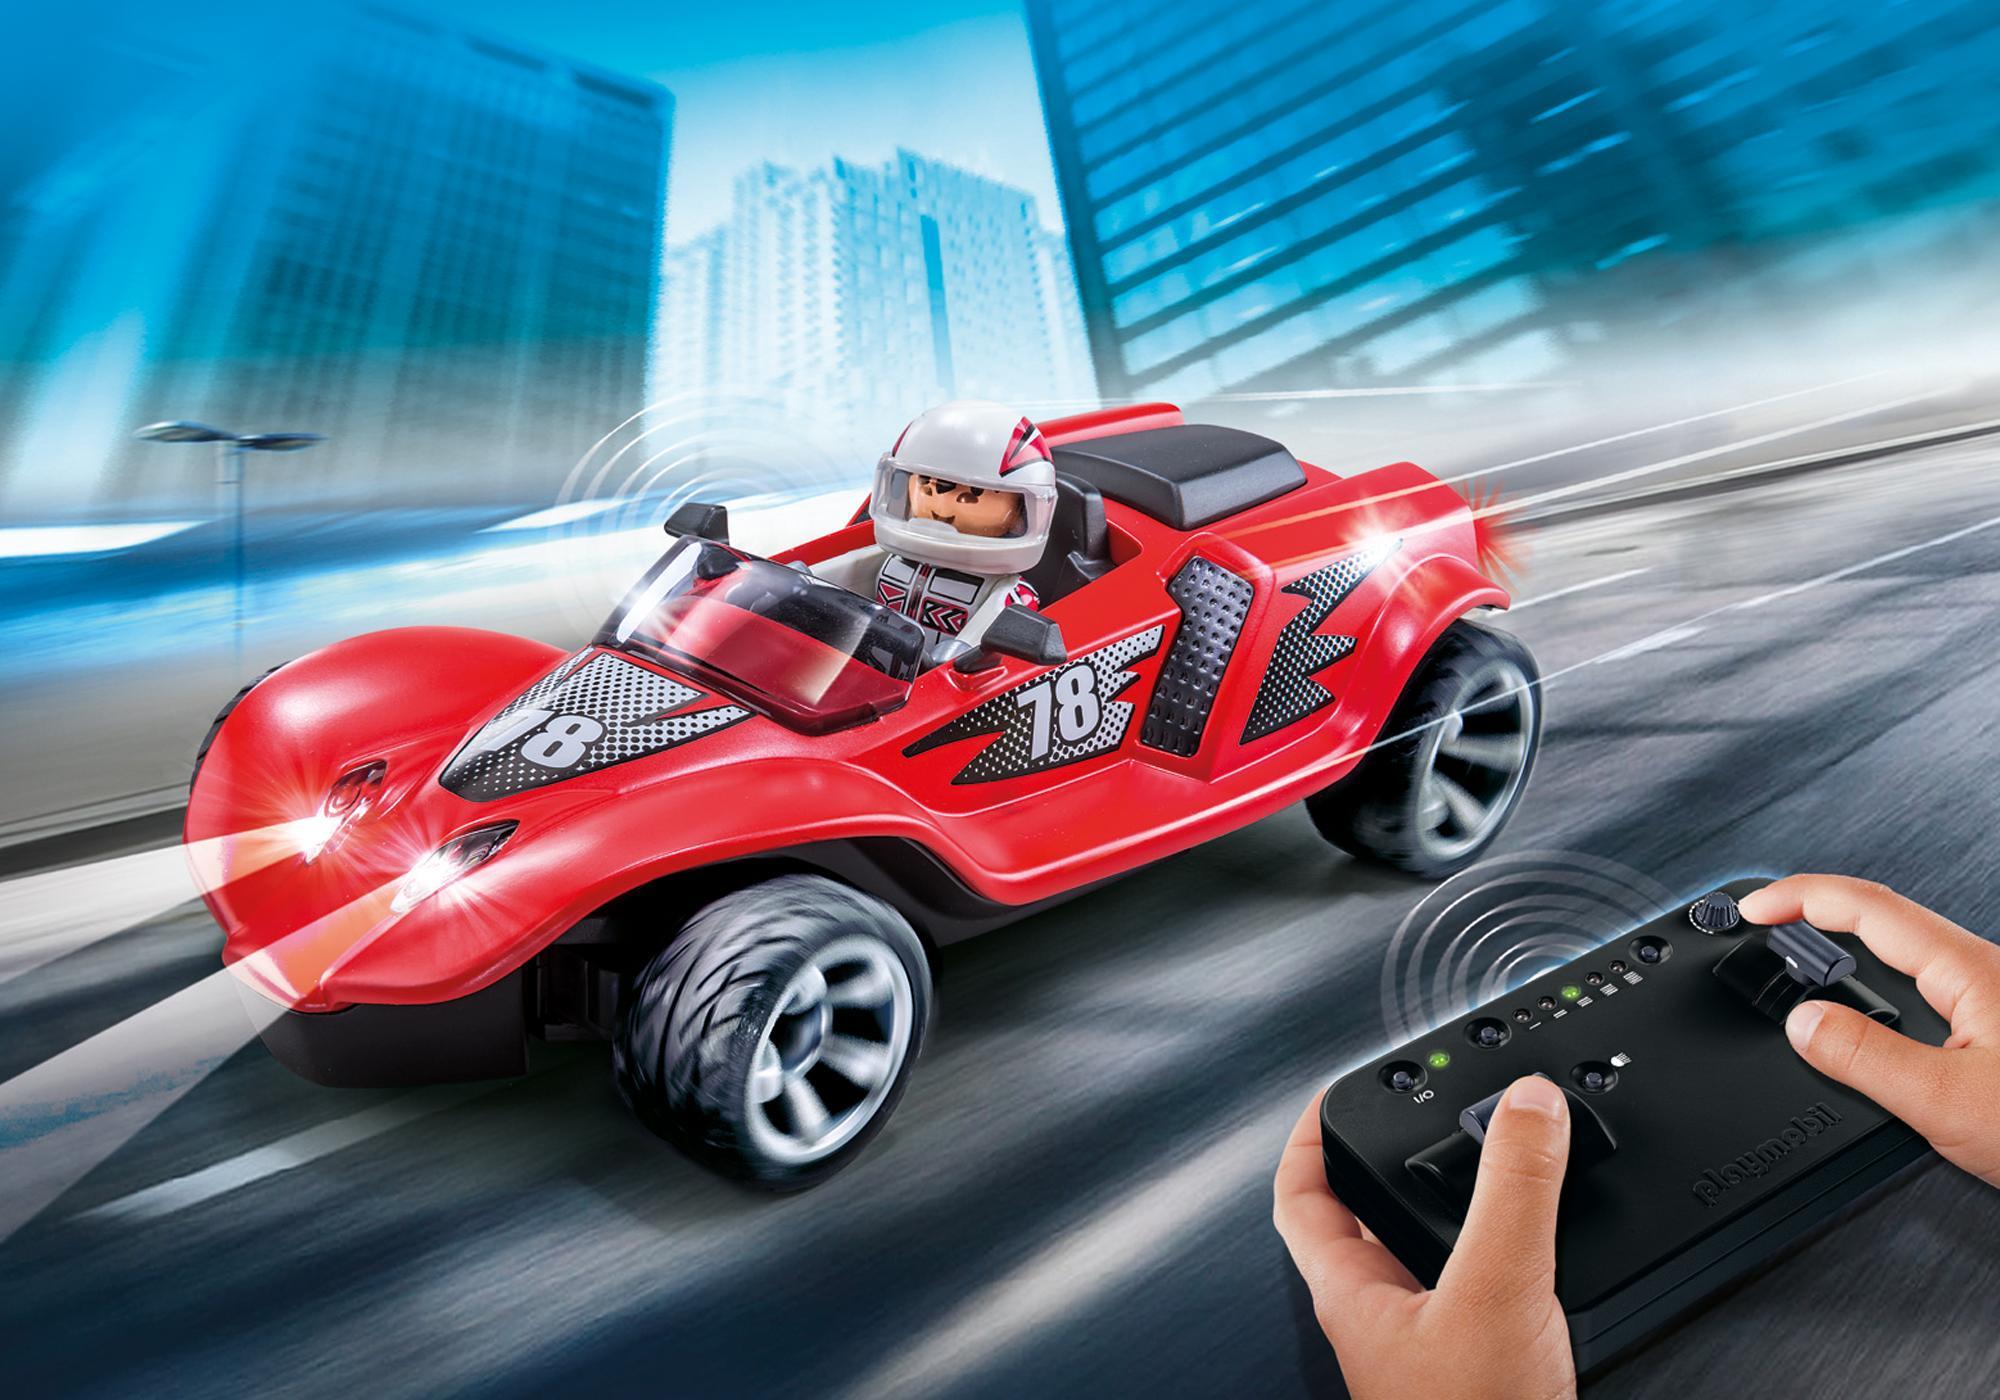 http://media.playmobil.com/i/playmobil/9090_product_detail/RC-Rocket-Racer